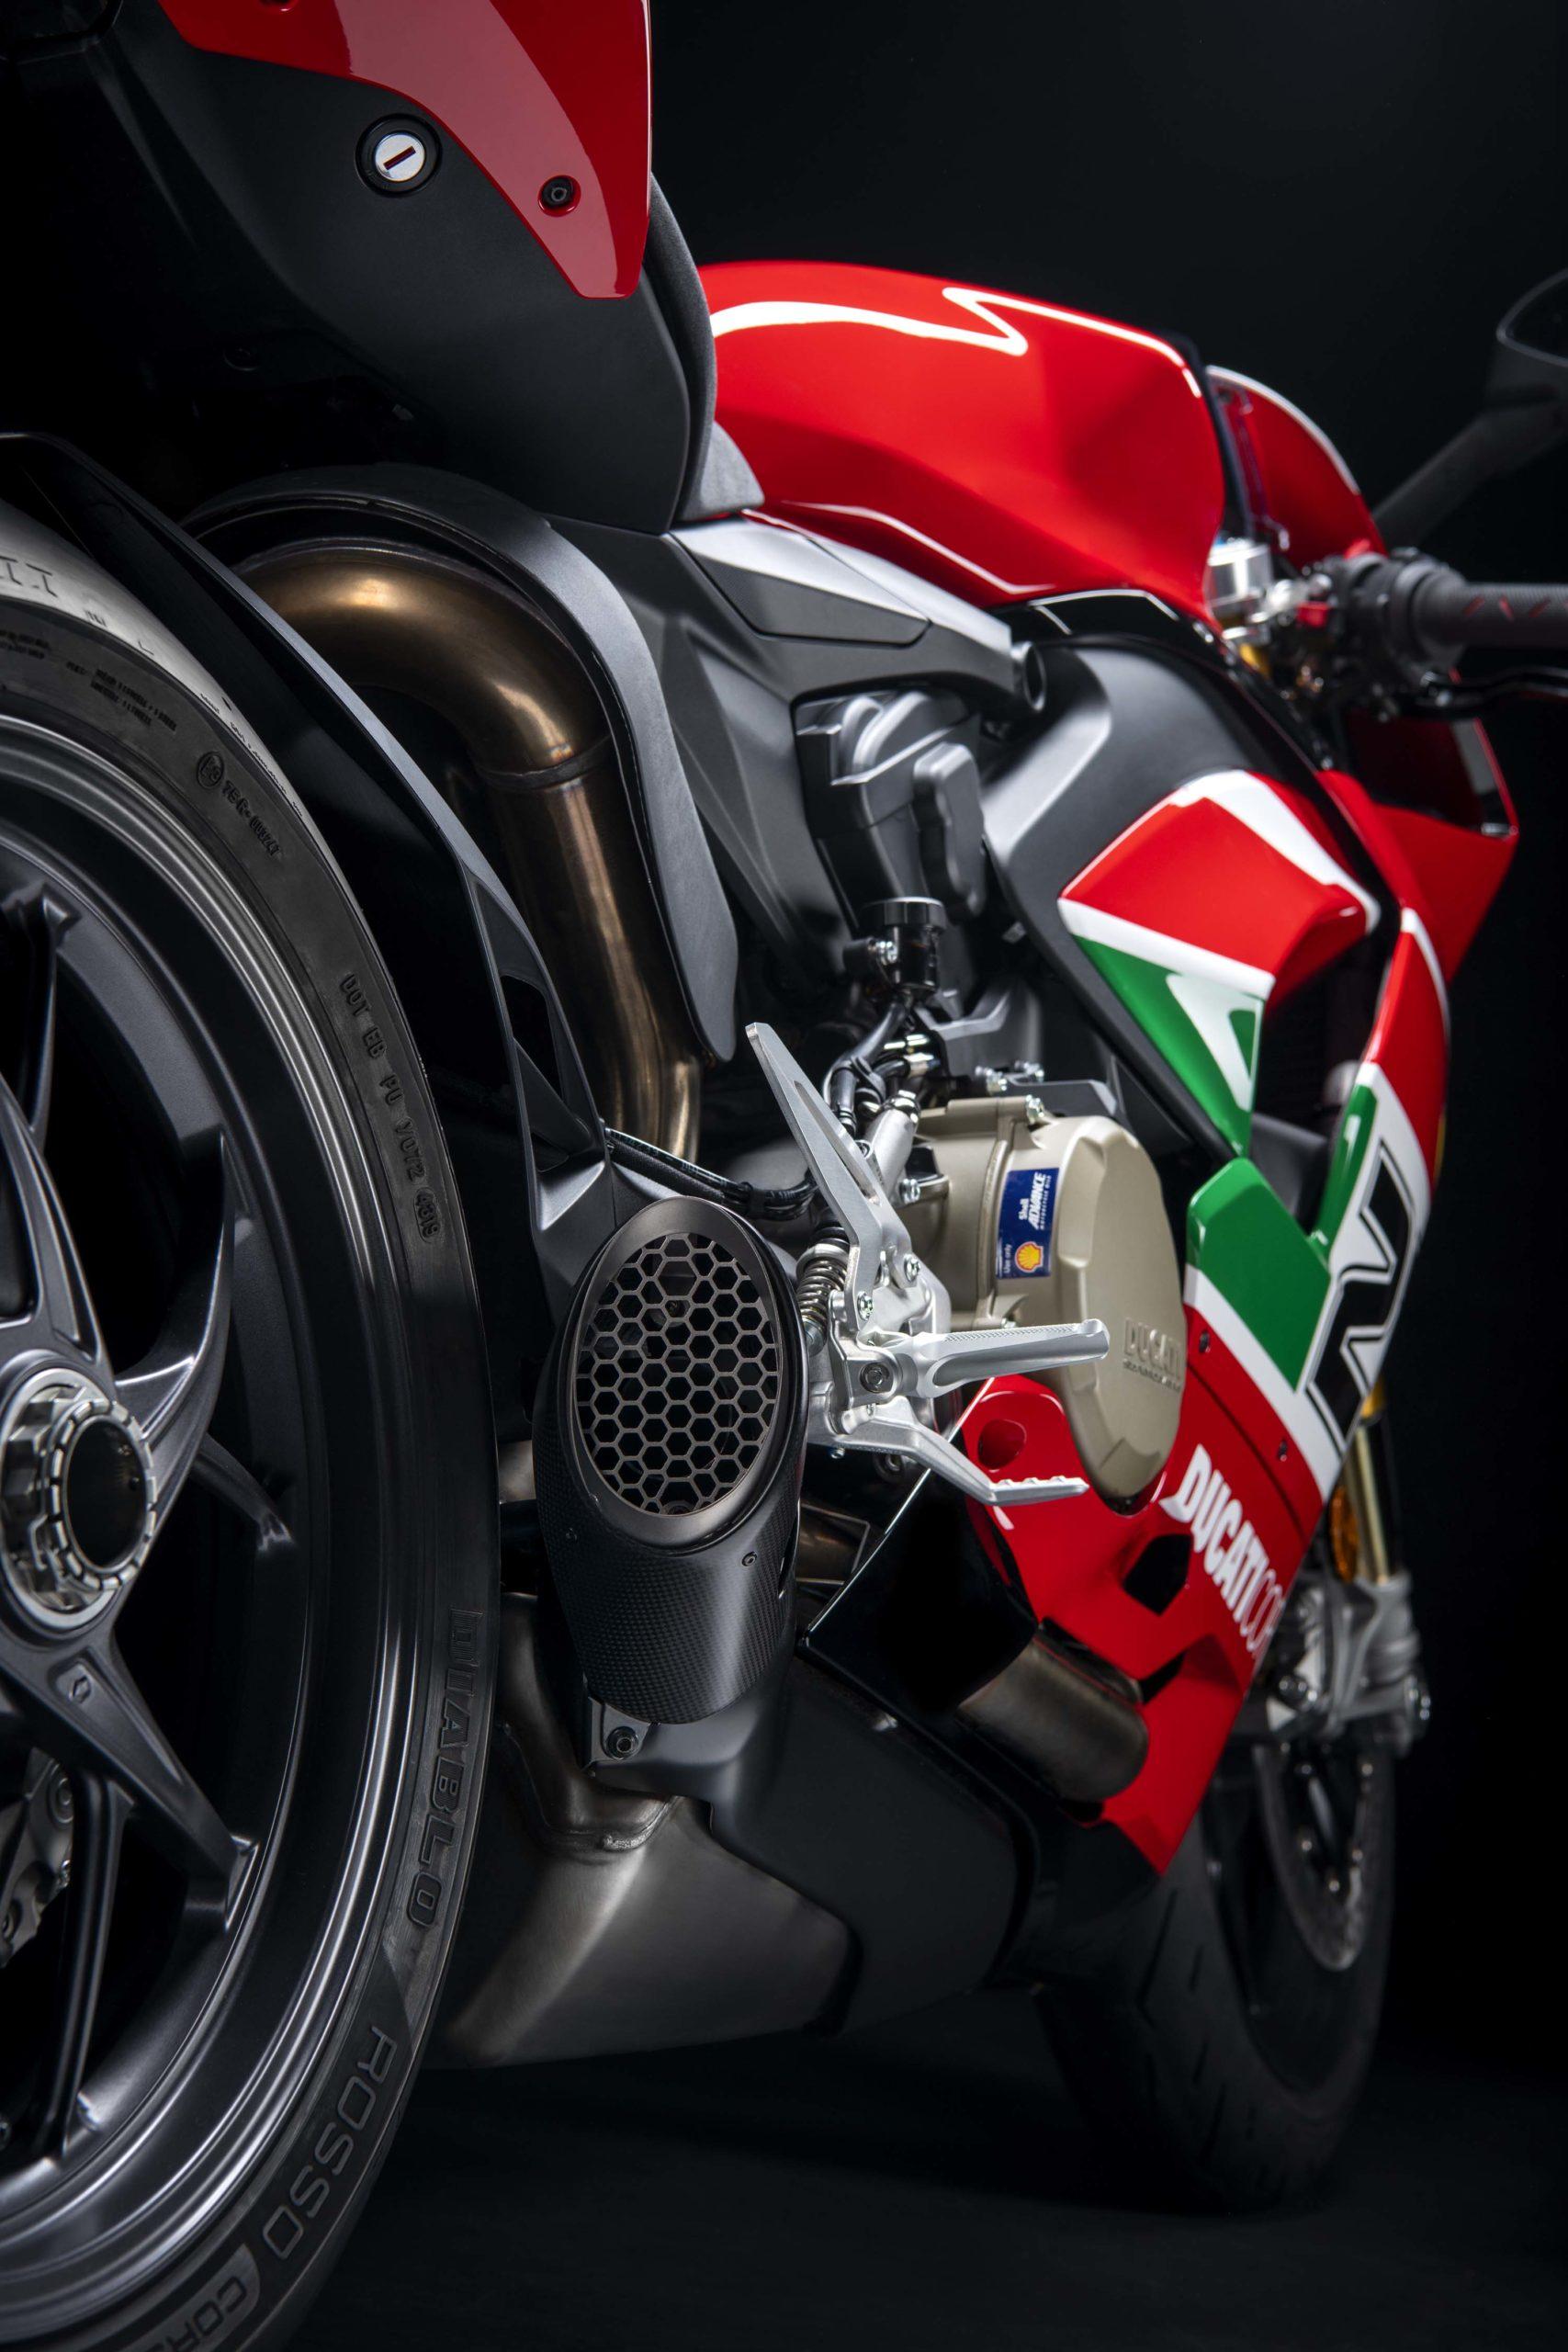 Ducati-Panigale-V4-Troy-Bayliss-67-scale